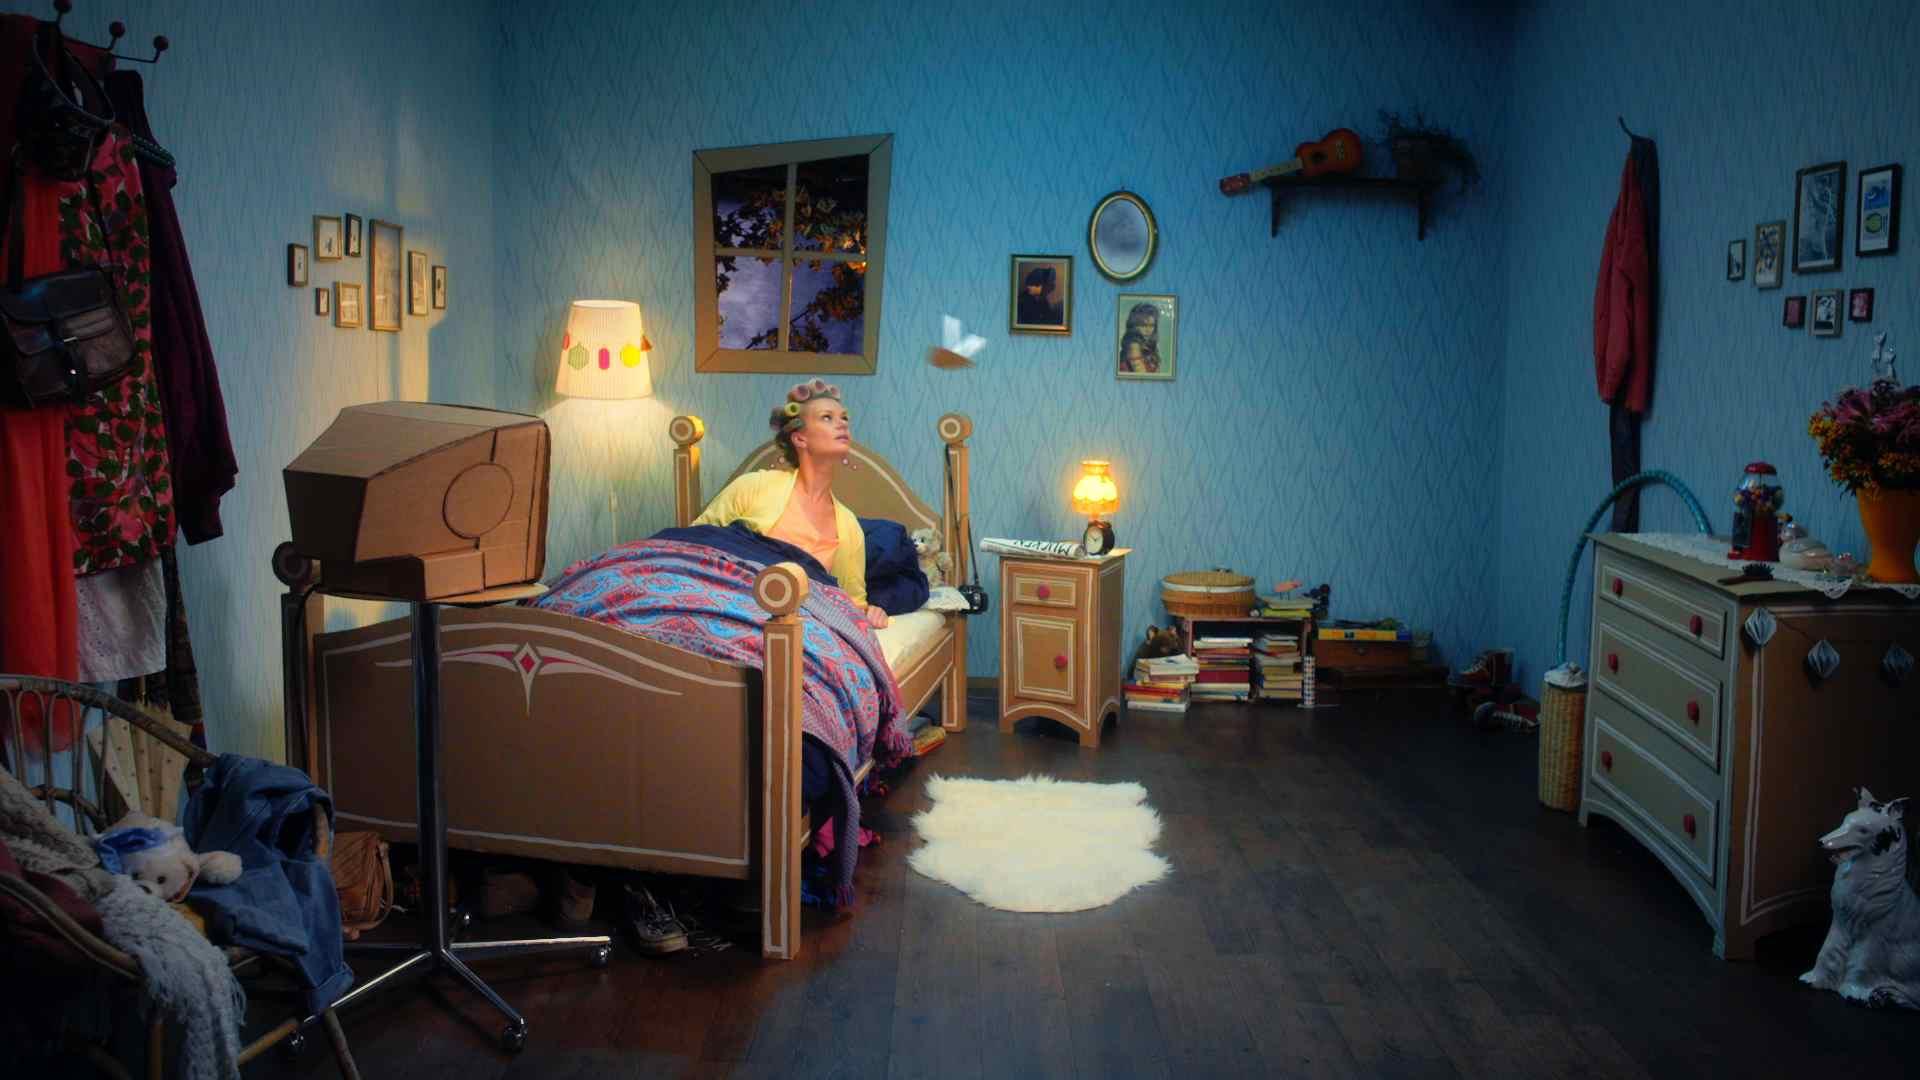 m cken nerven leute jessica d rwald. Black Bedroom Furniture Sets. Home Design Ideas